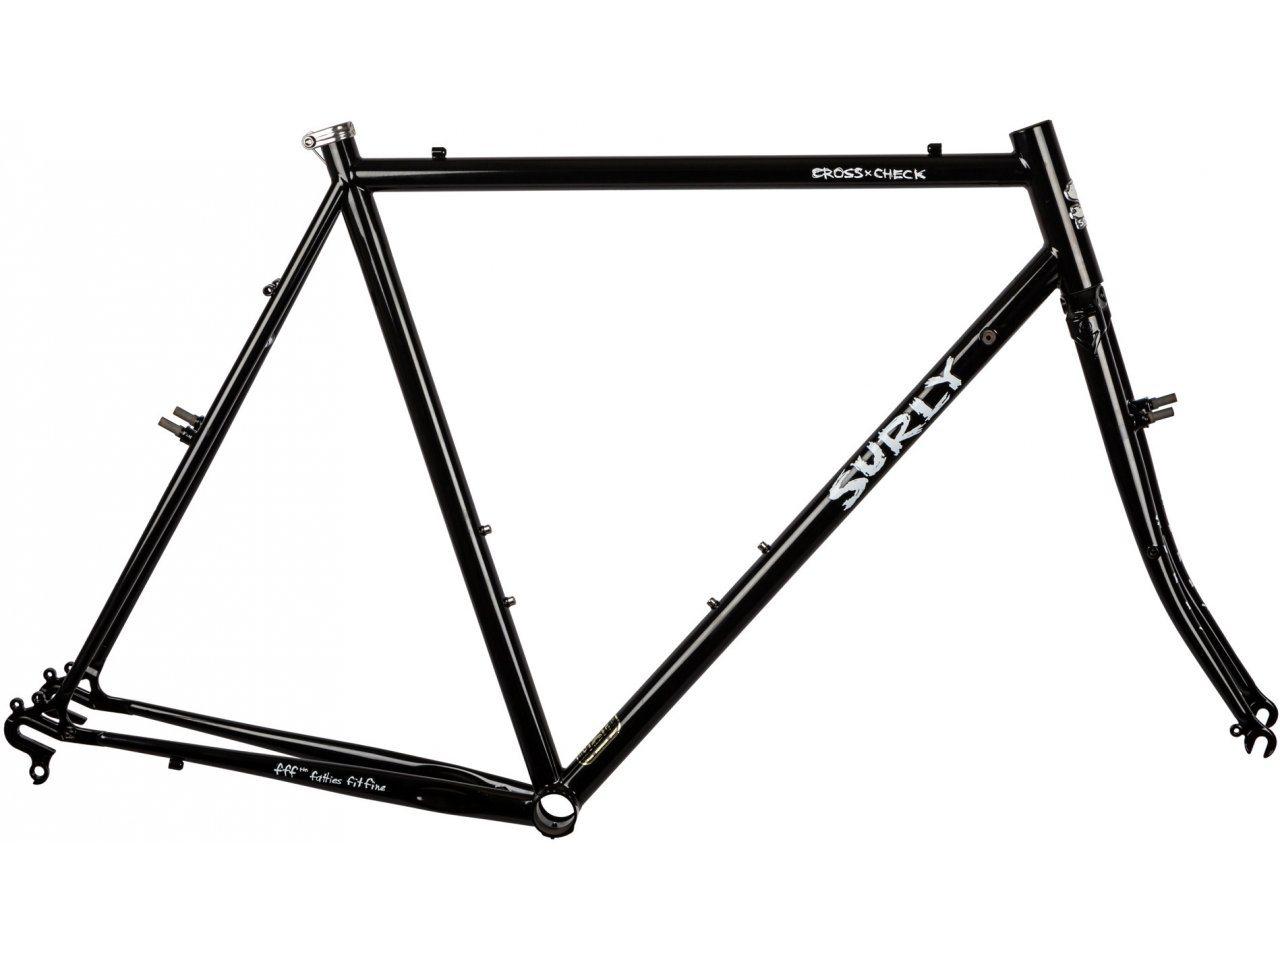 Surly-Cross-Check-28-Rahmenkit-gloss-black bild 1